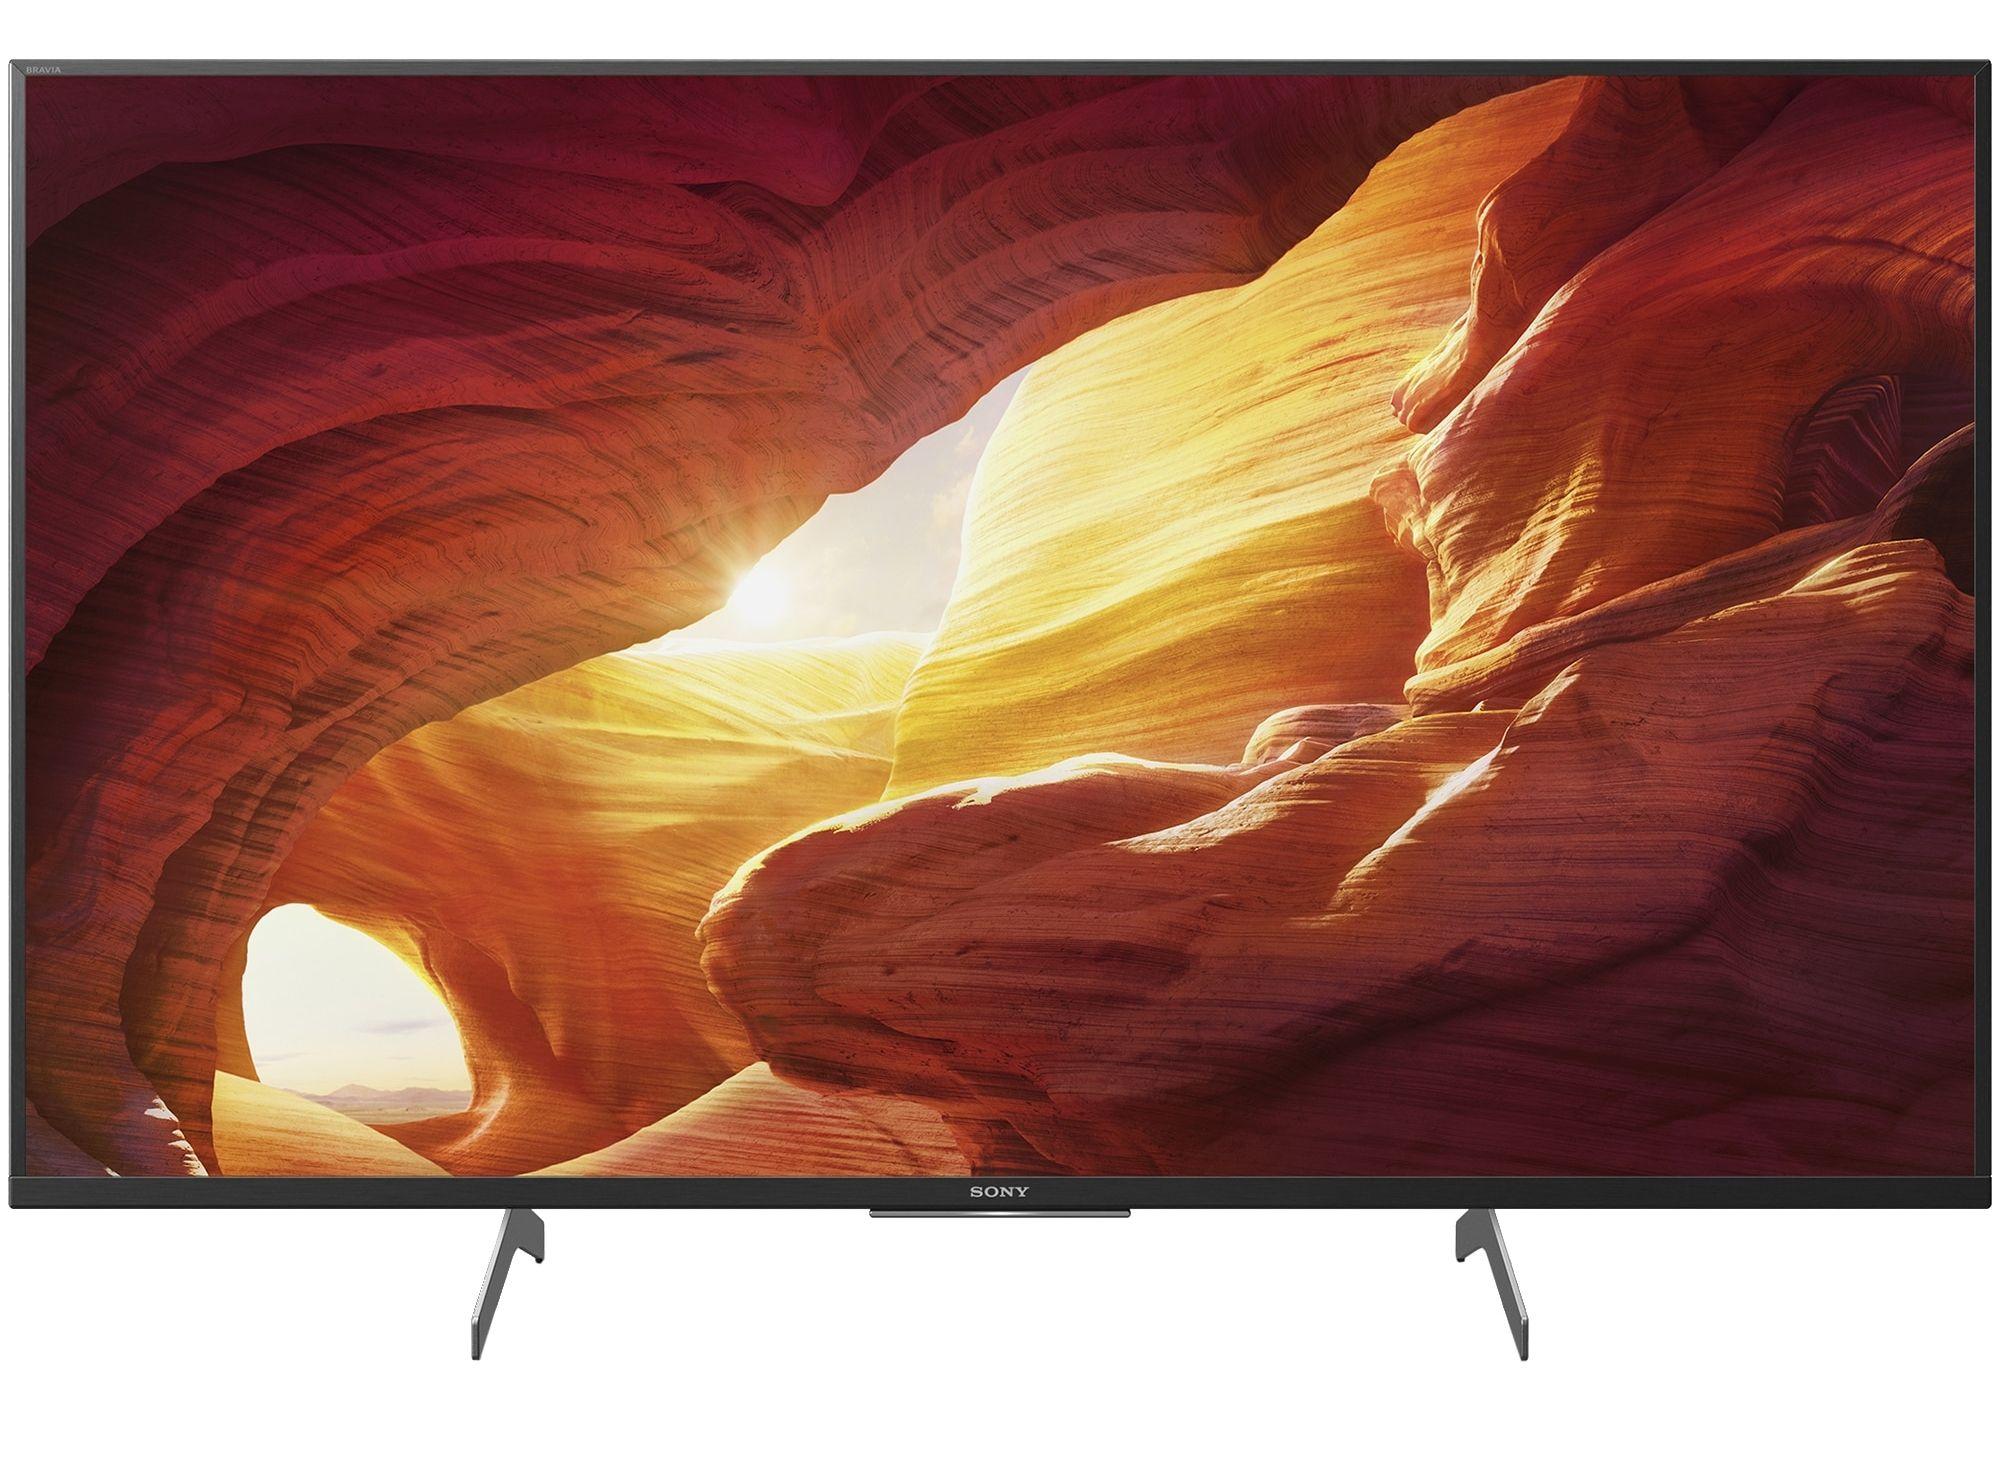 Телевизор Sony 43XH8596, 43″ (108 cм), Smart Android, 4K Ultra HD, LED